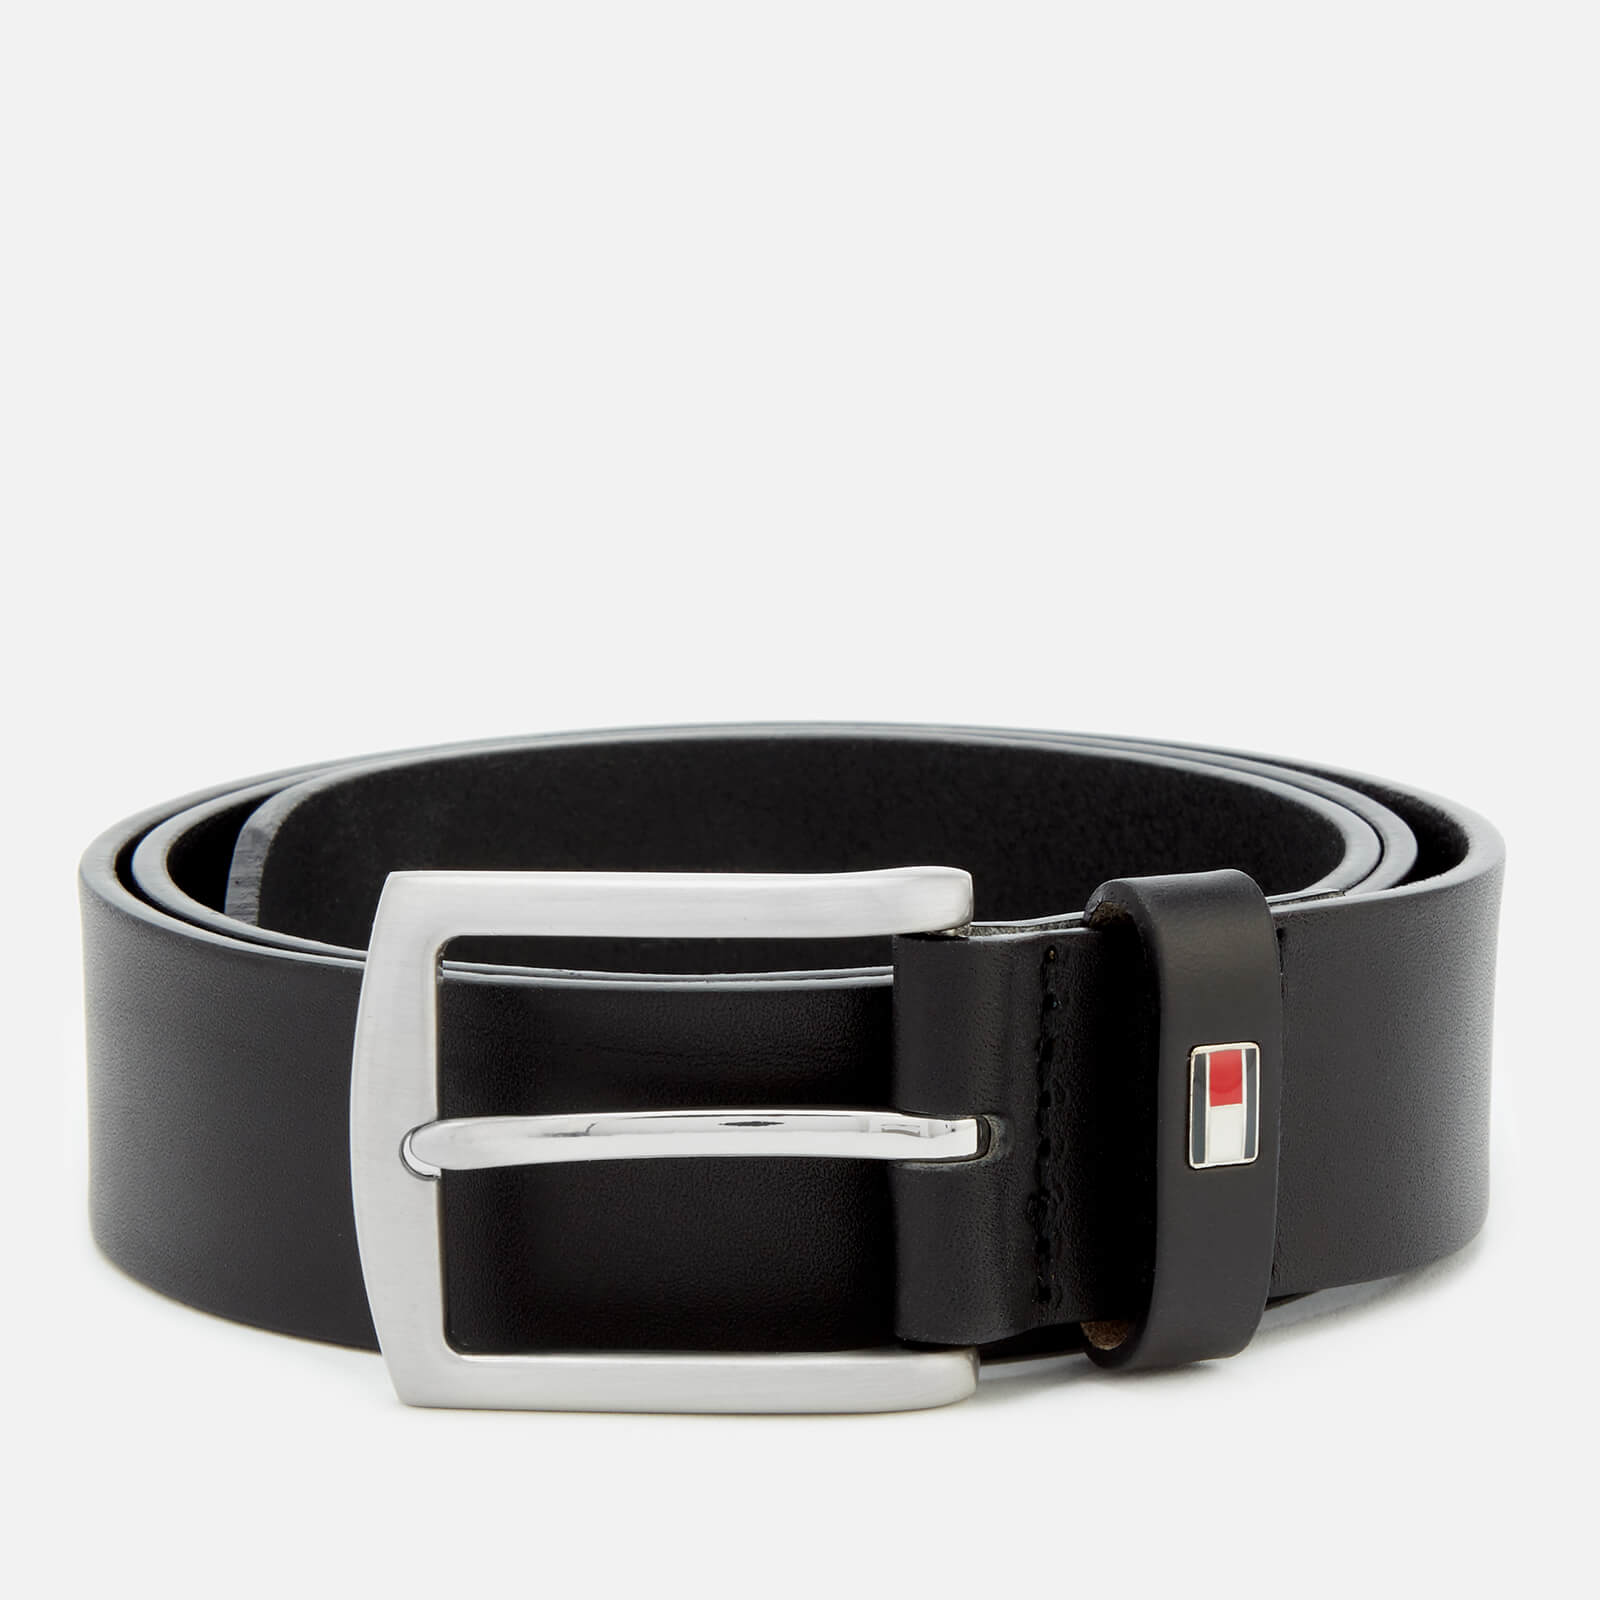 e4e77b5f576 Tommy Hilfiger Men's New Denton Belt 3.5 - Black